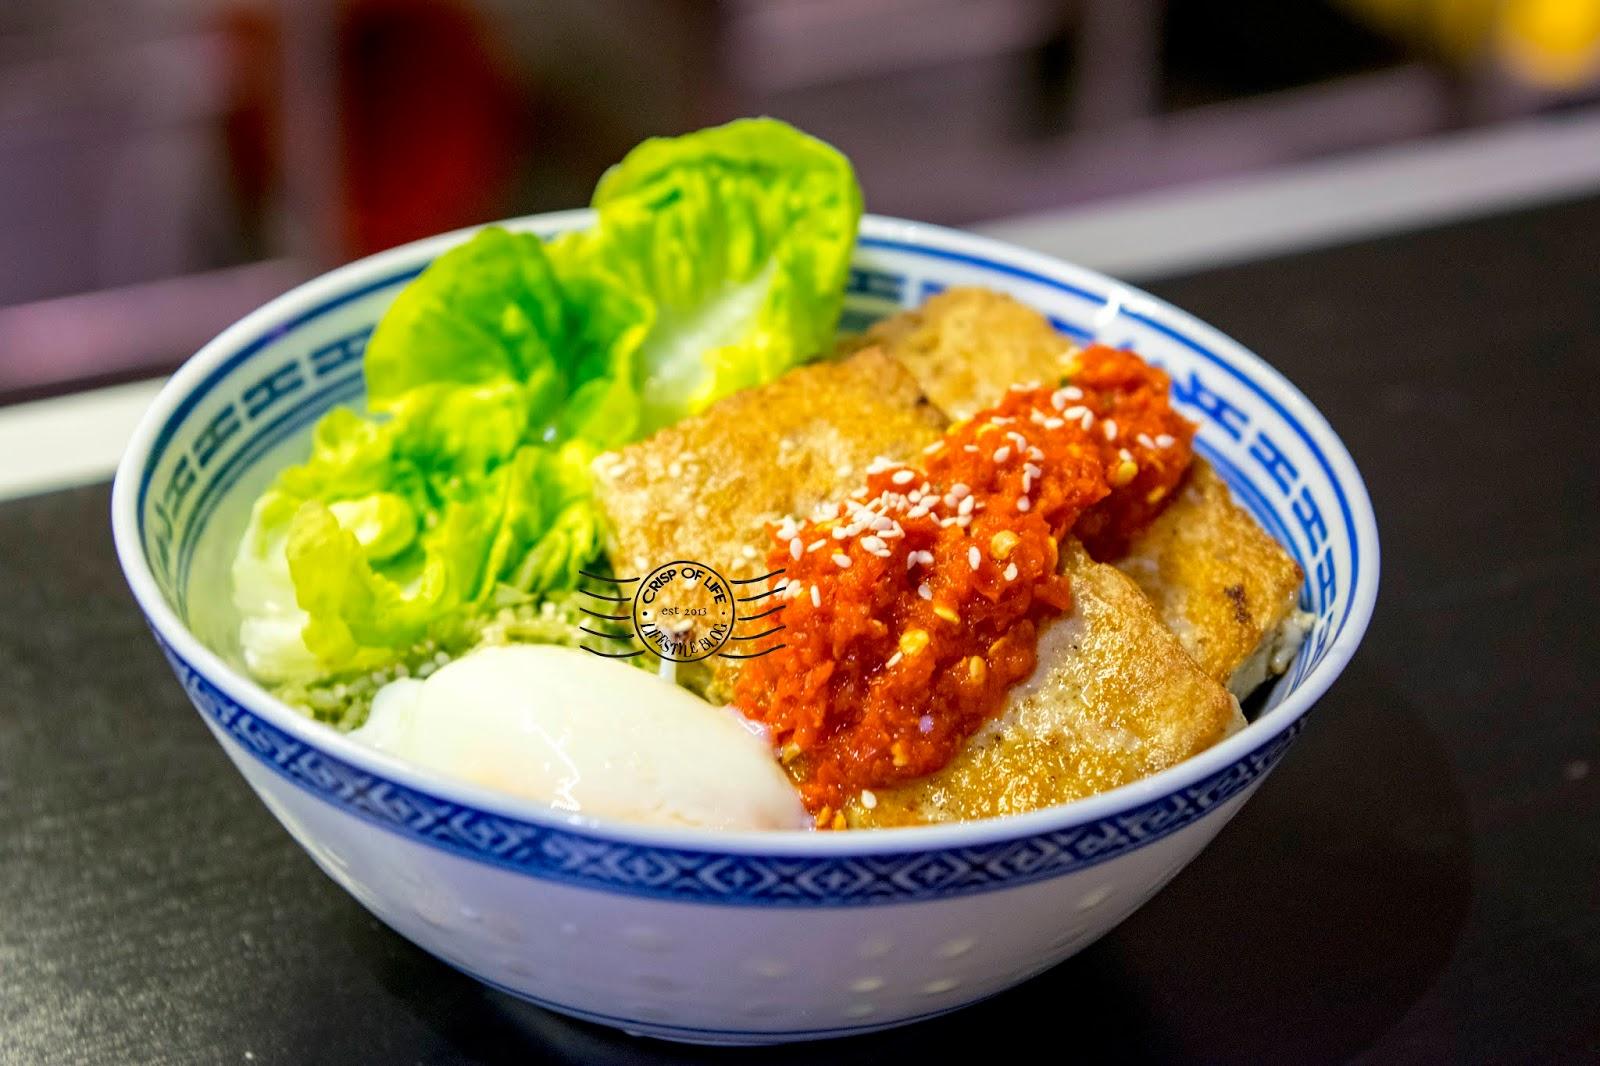 Li Restaurant 力 at Damansara Jaya, Petaling Jaya